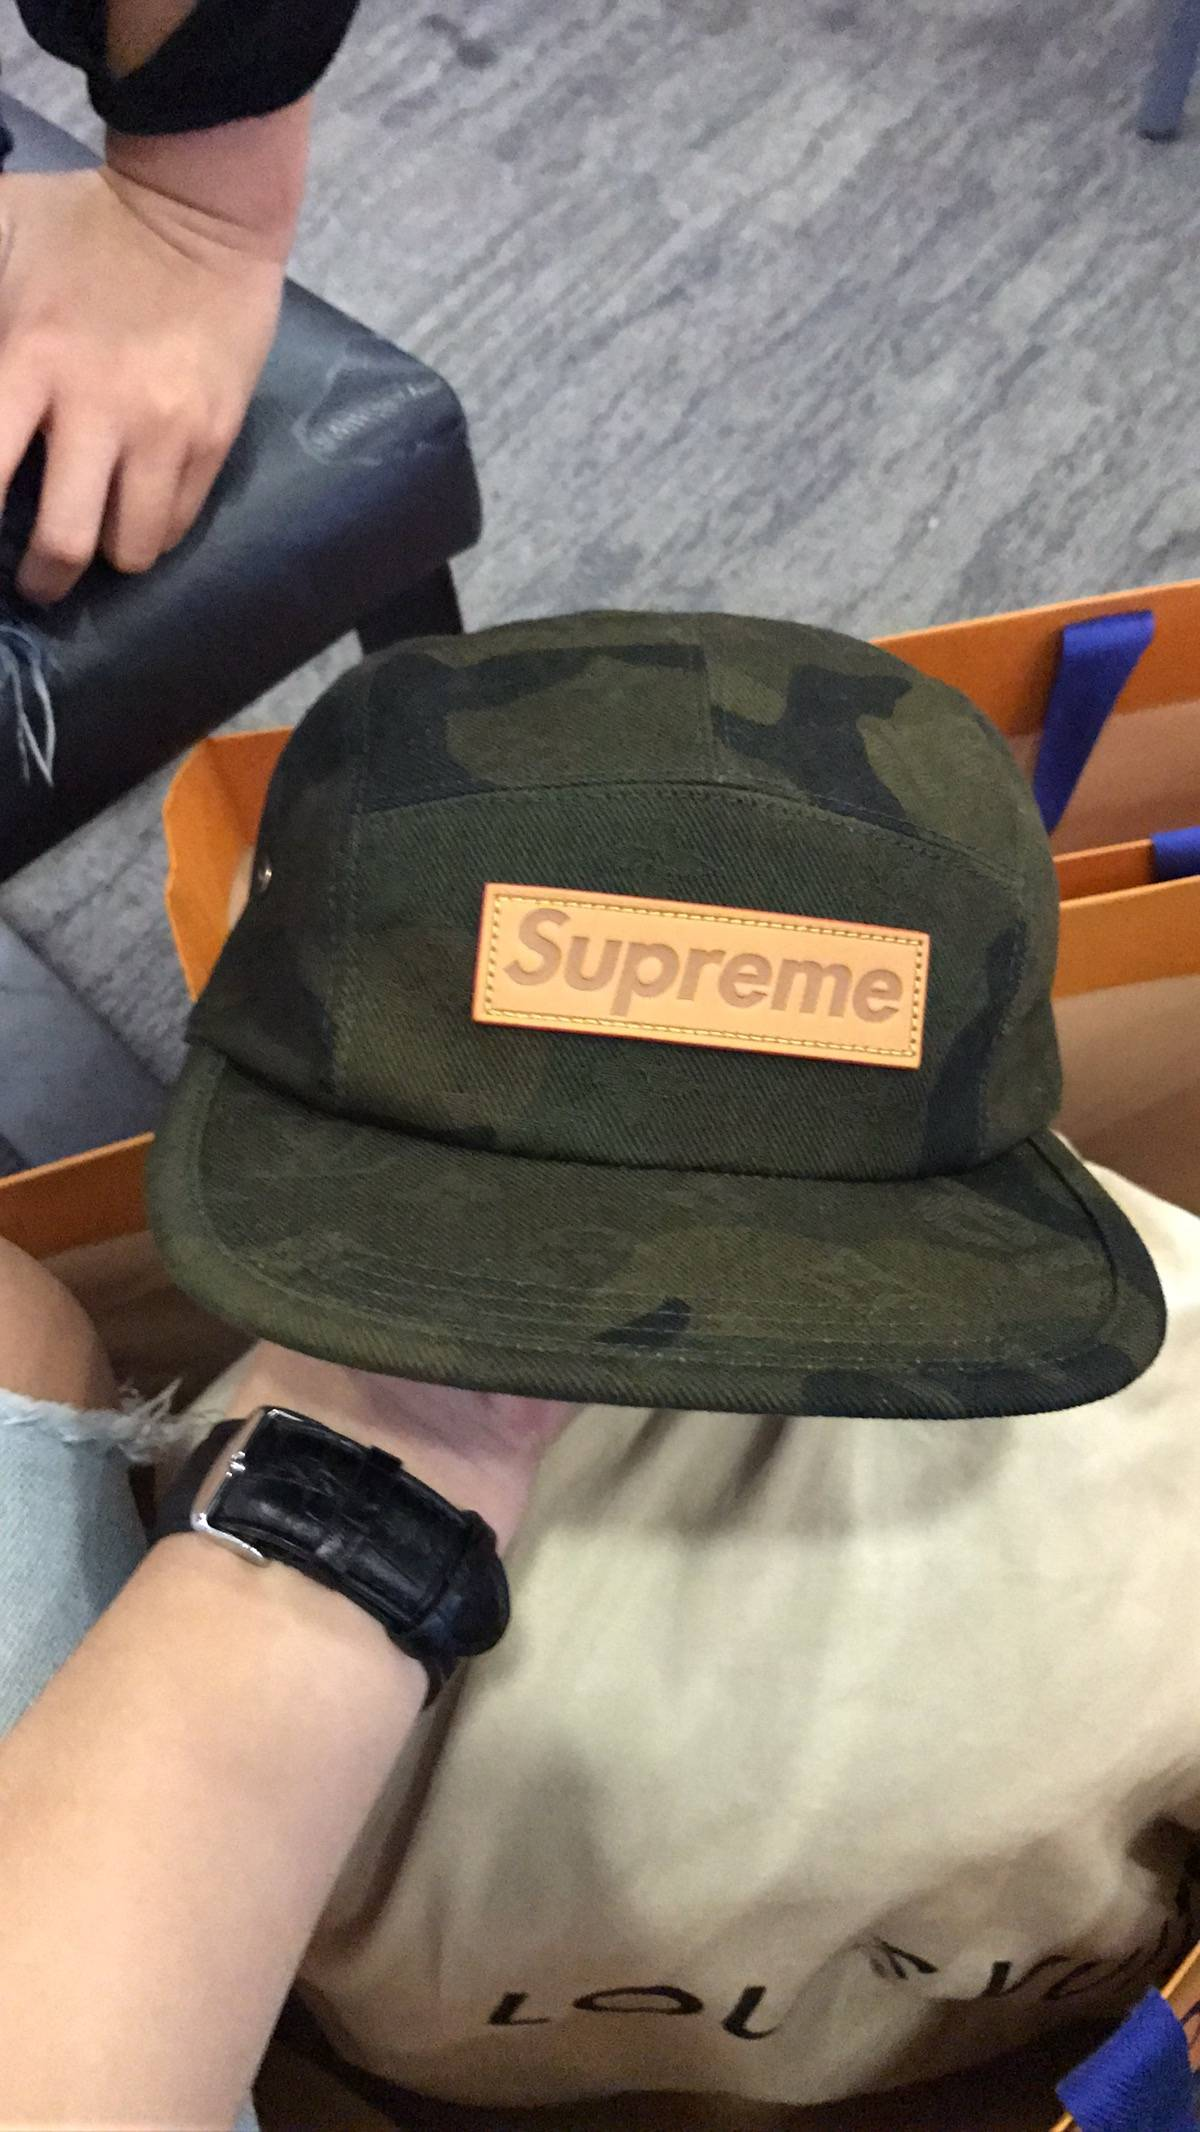 Supreme Supreme x LV Camo Camp Cap Size one size - Hats for Sale ... 63b44a802025